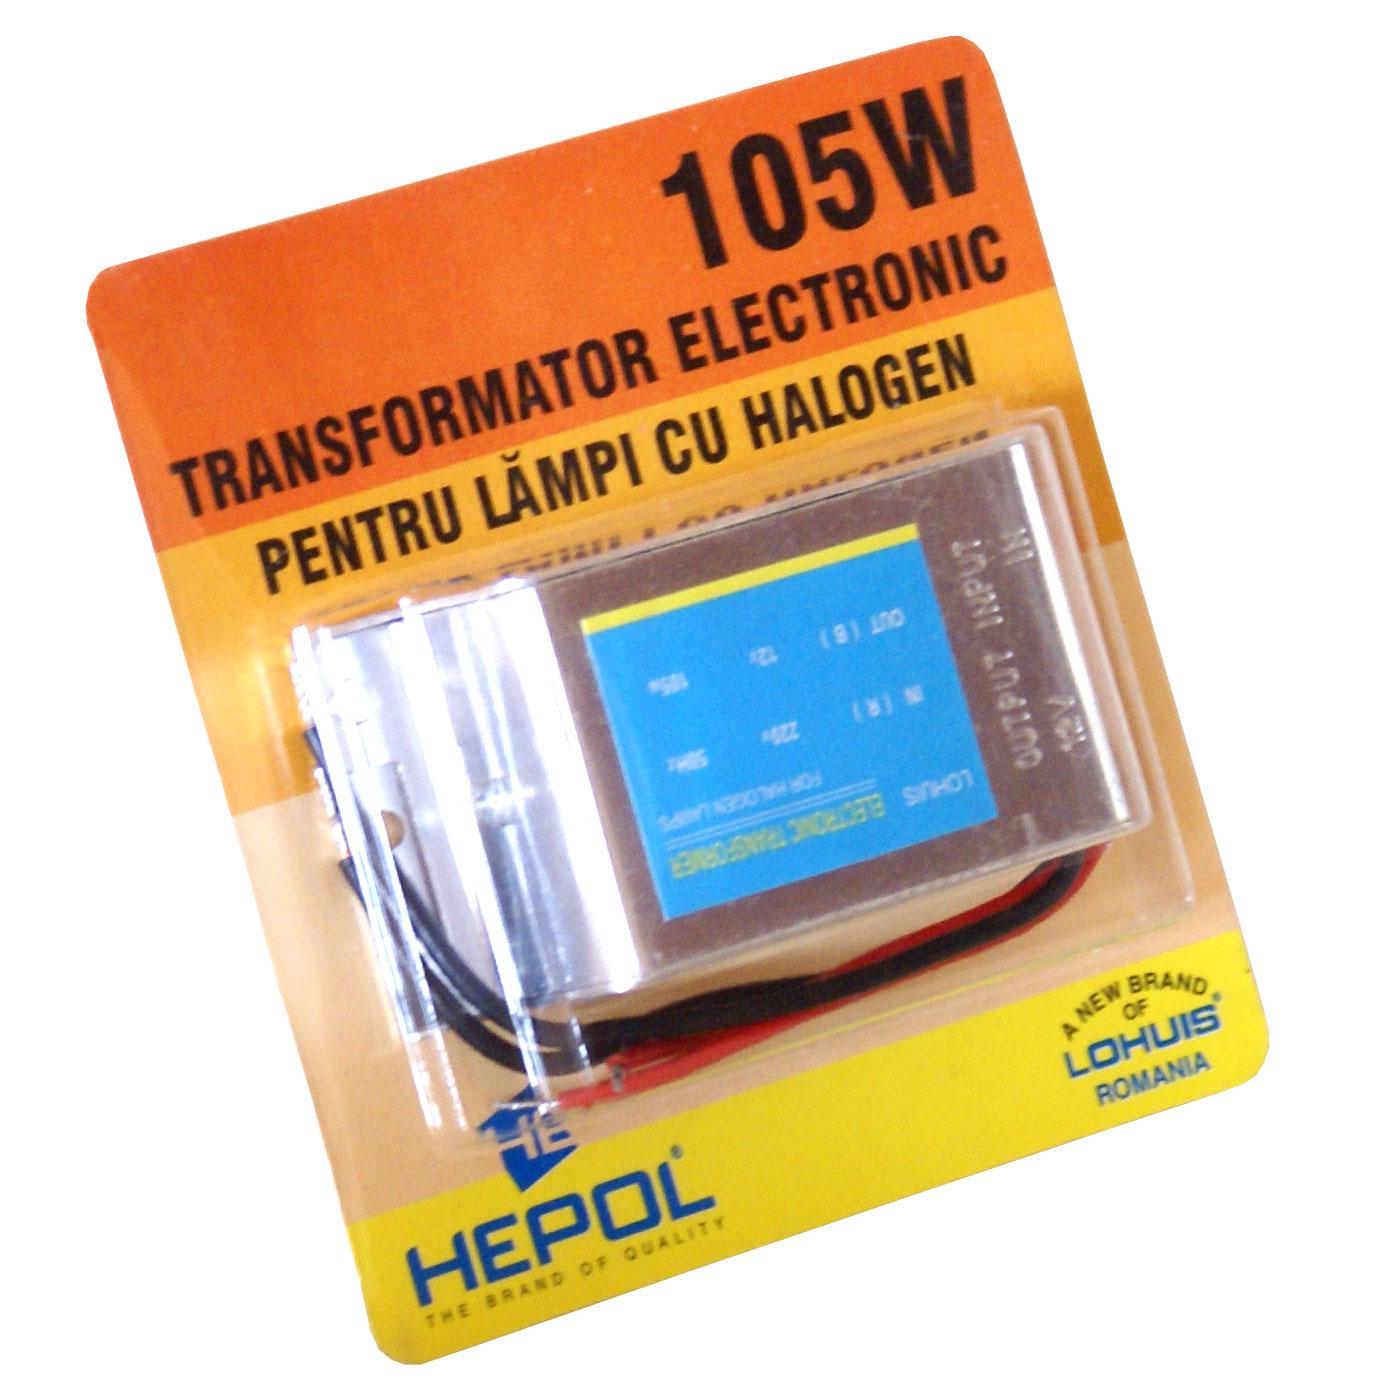 Transformator electronic HEPOL, pentru lampi cu halogen, 12V, 105W